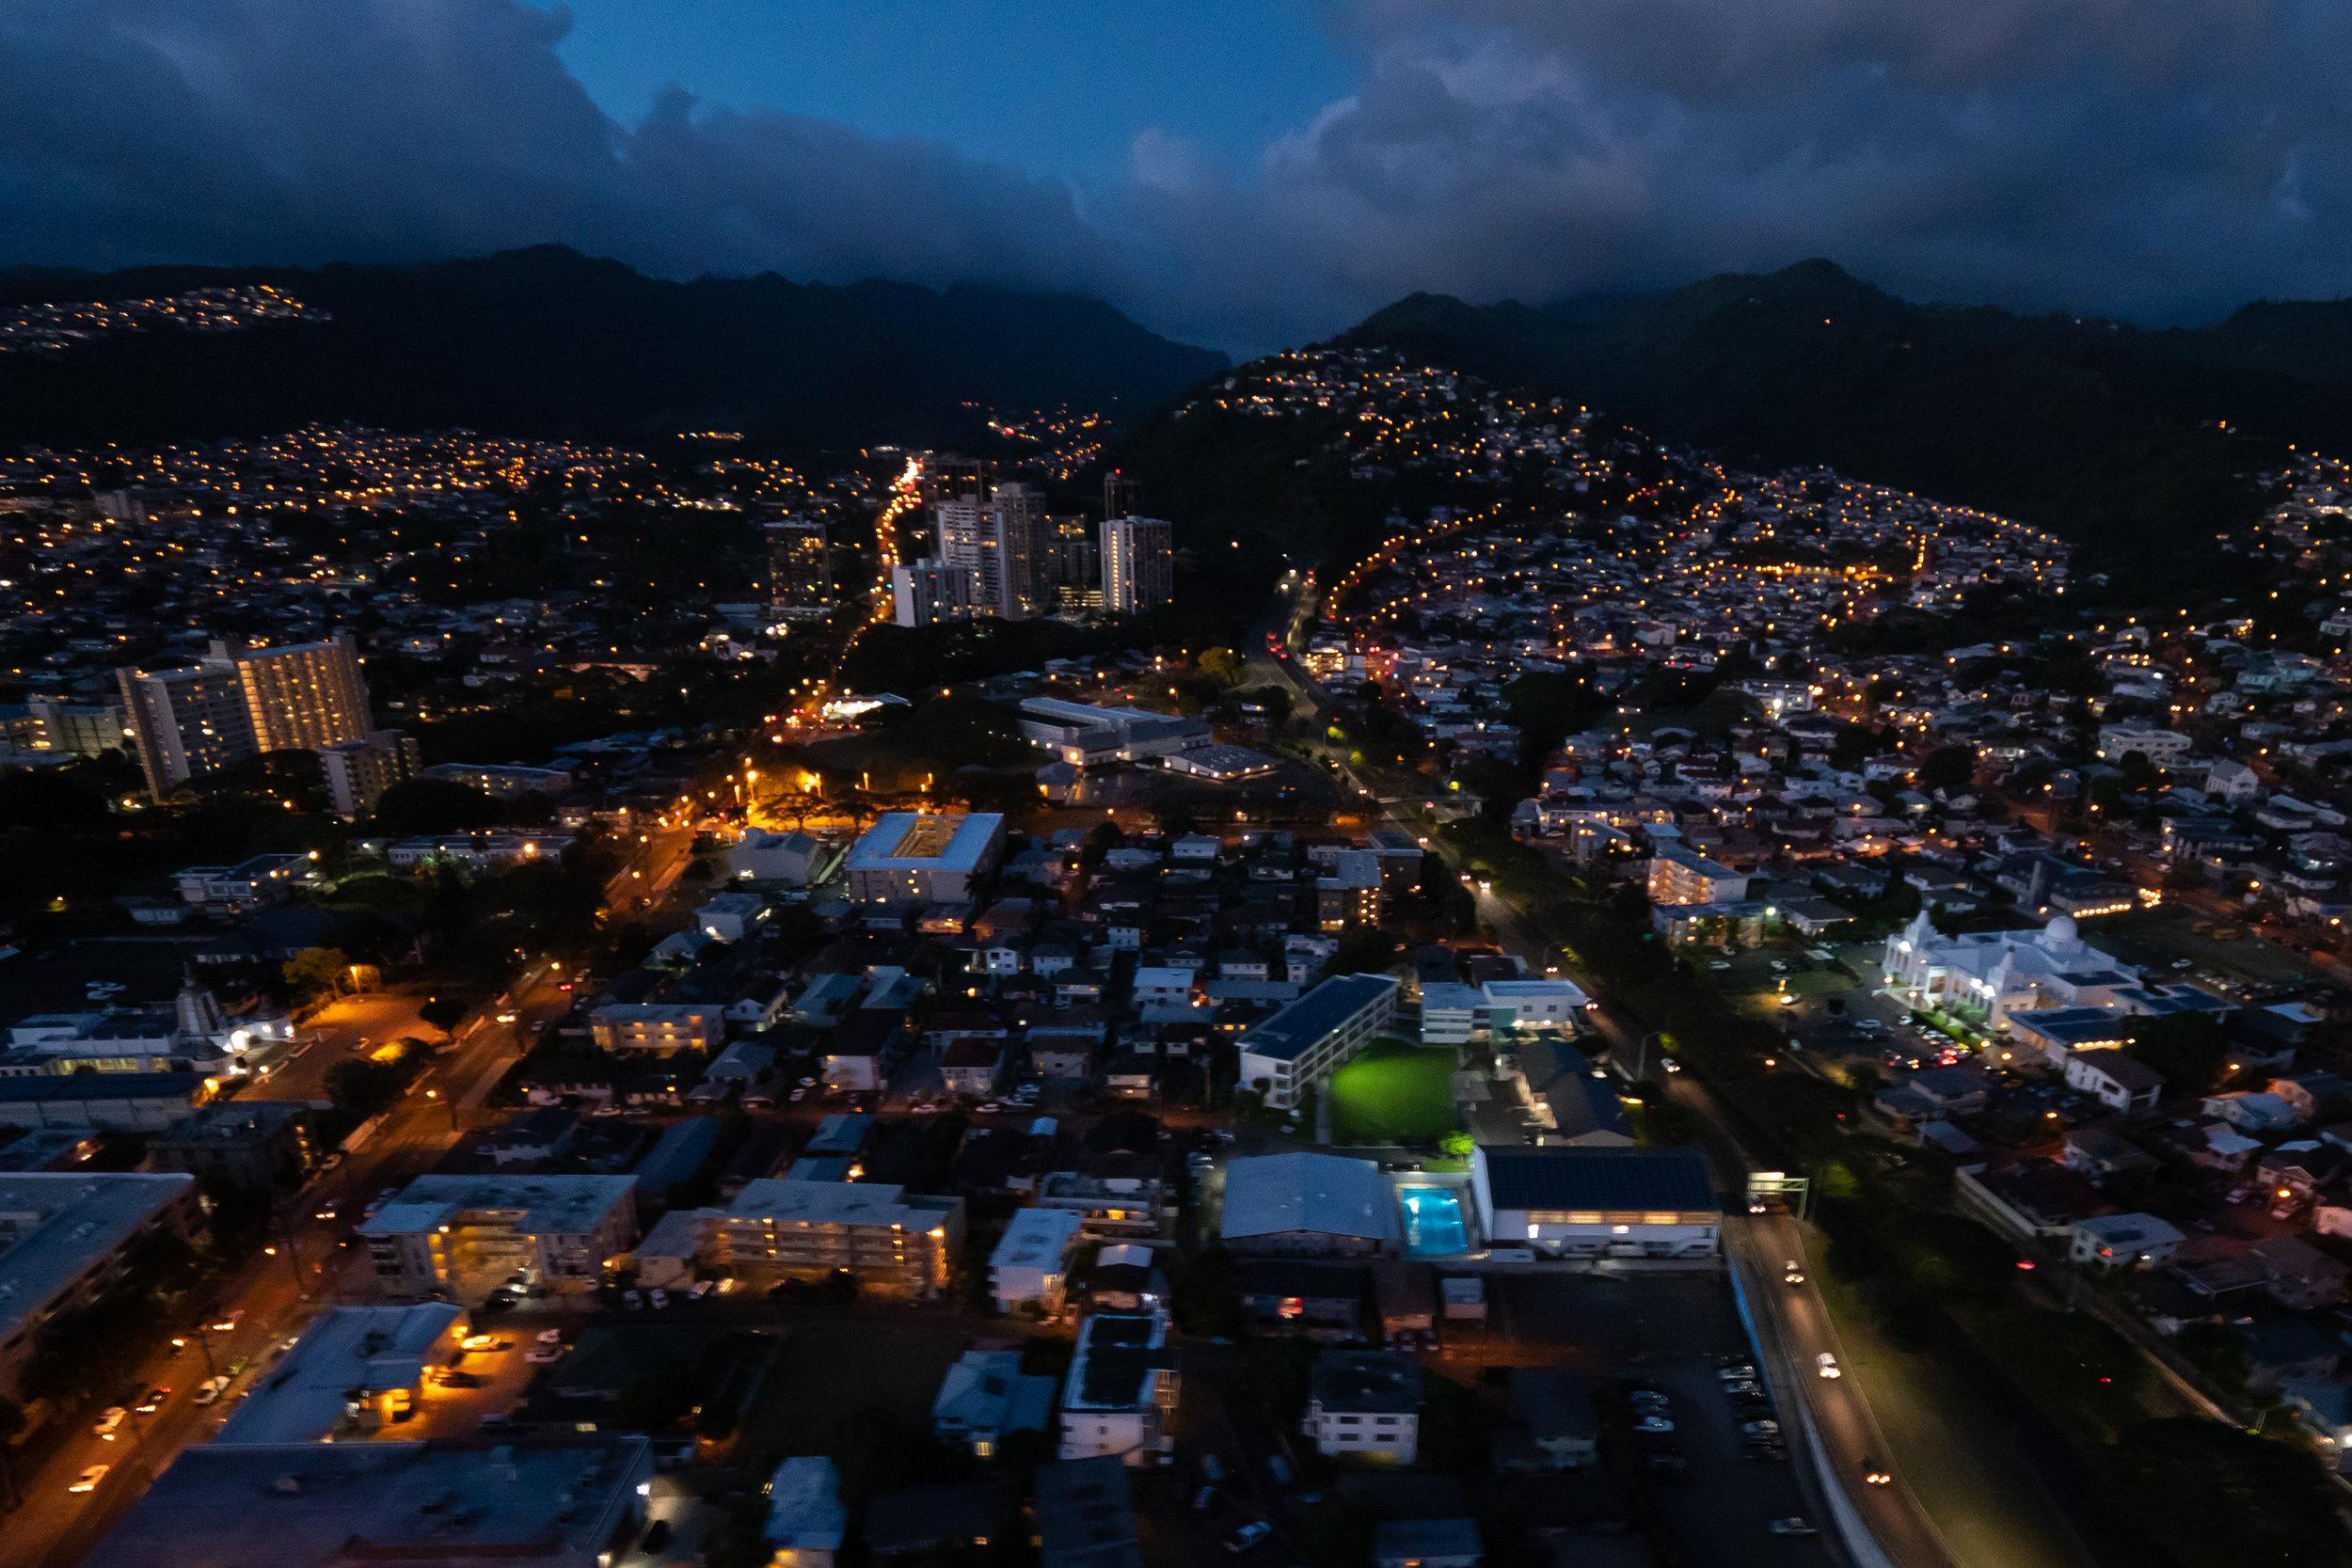 20180601_JohnsonControls_Aerial_Honolulu-5885.jpg